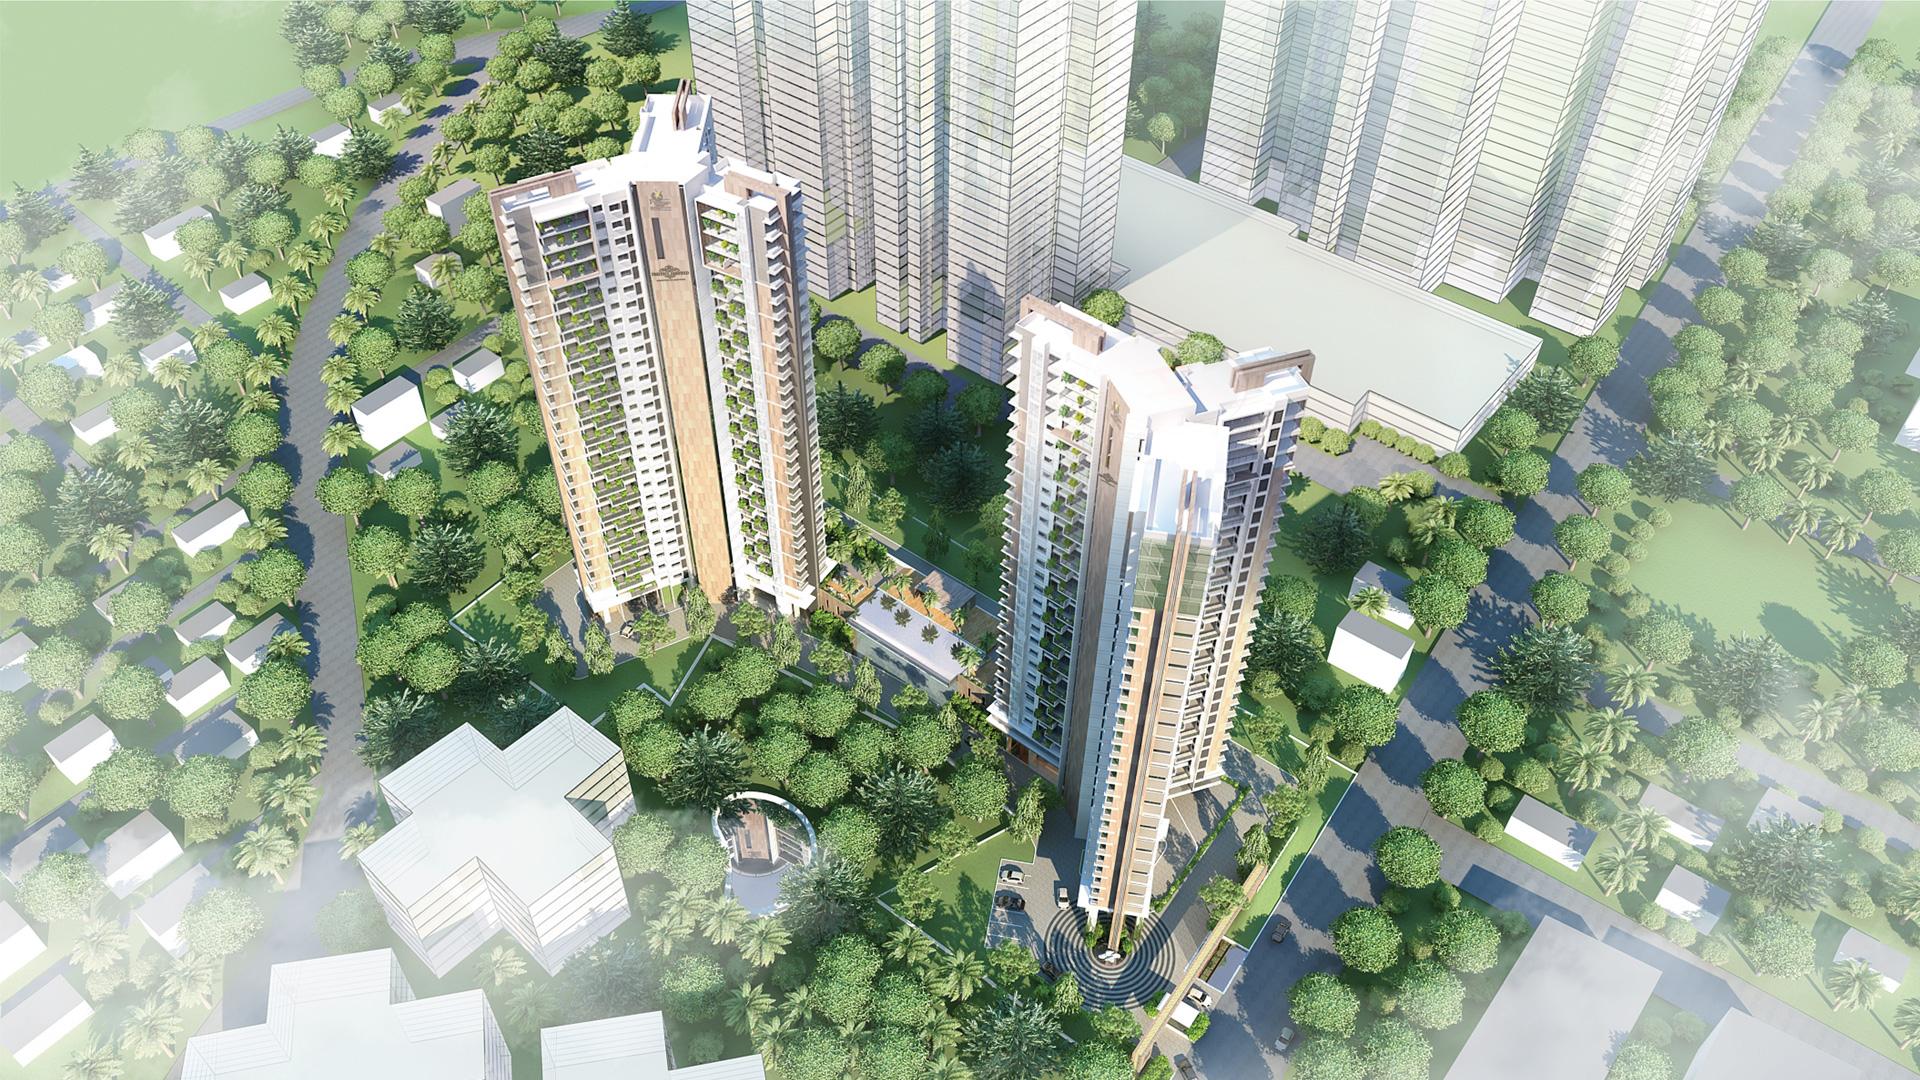 prestige-fairfield-Apartment-in-Dollars-colony-Sanjay-Nagar-Bangalore-Image-02